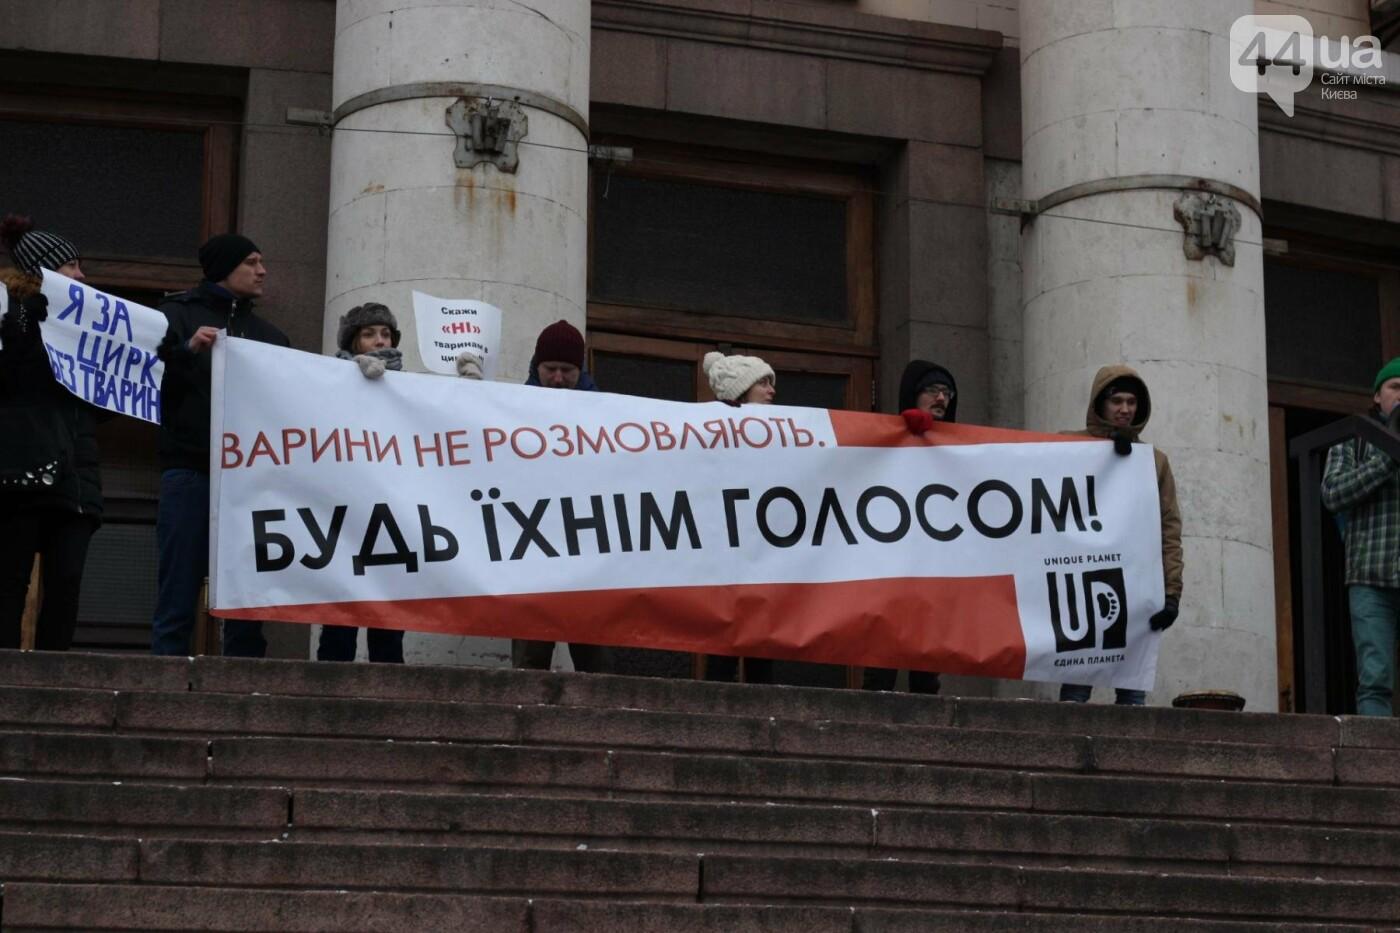 Цирк без животных: как в Киеве прошла акция протеста, фото-38